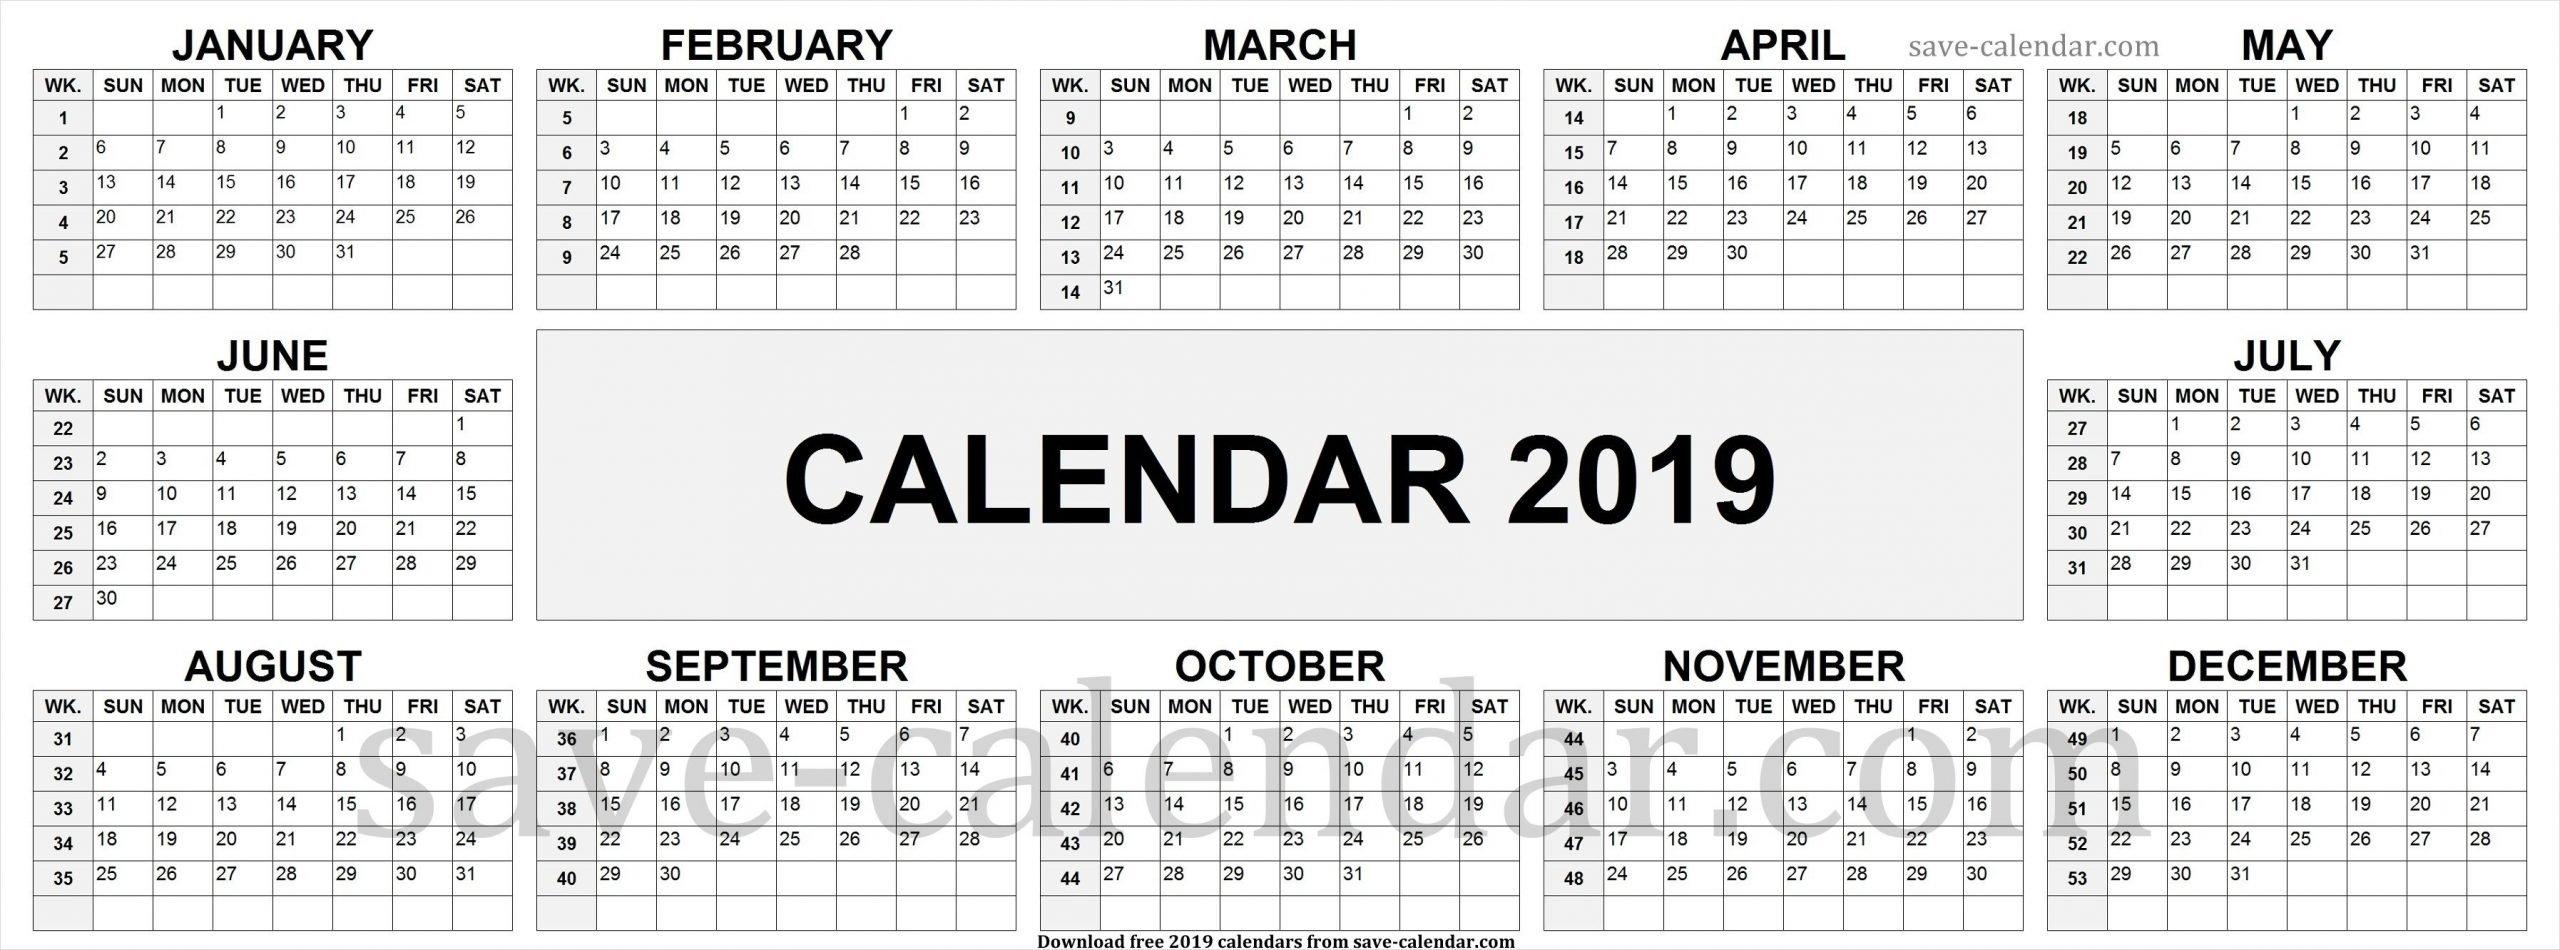 Take Depo Provera Perpetual Calendar 2020 | Calendar Printables Free Blank regarding Perpetual Calendar Depo-Provera Injection Graphics